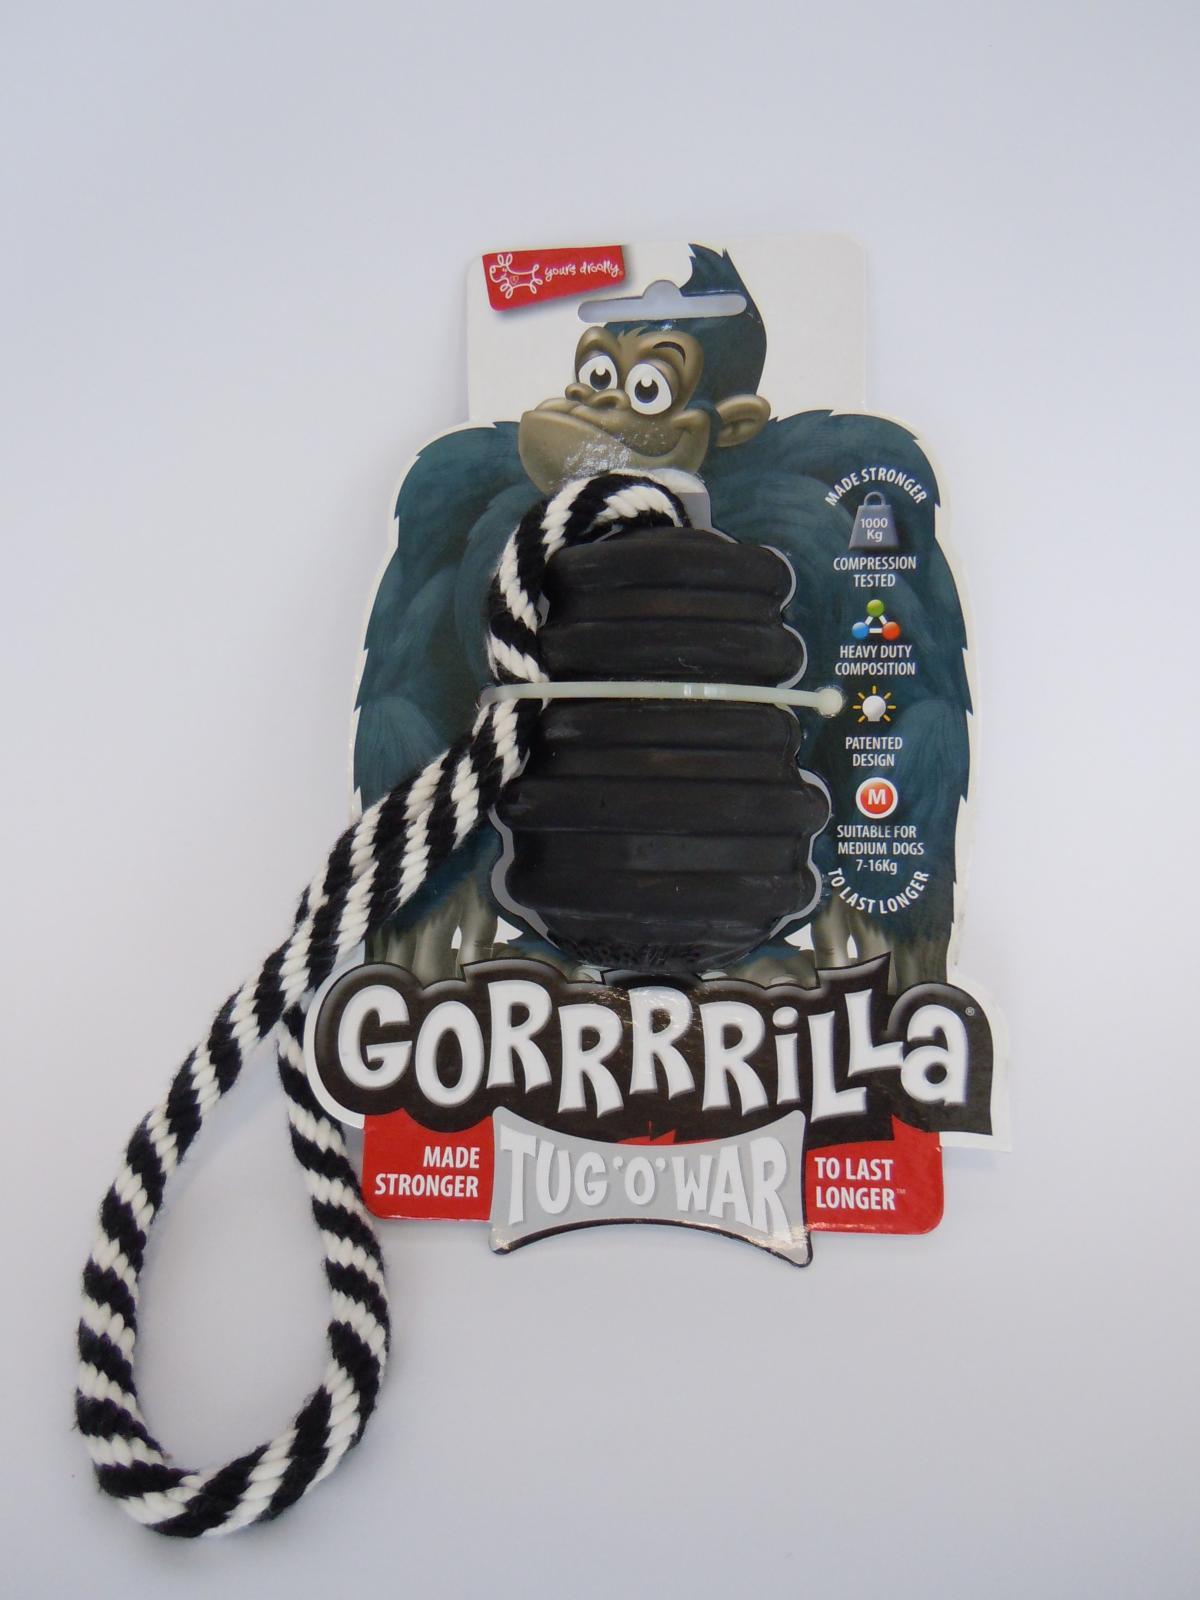 Gorrrrilla